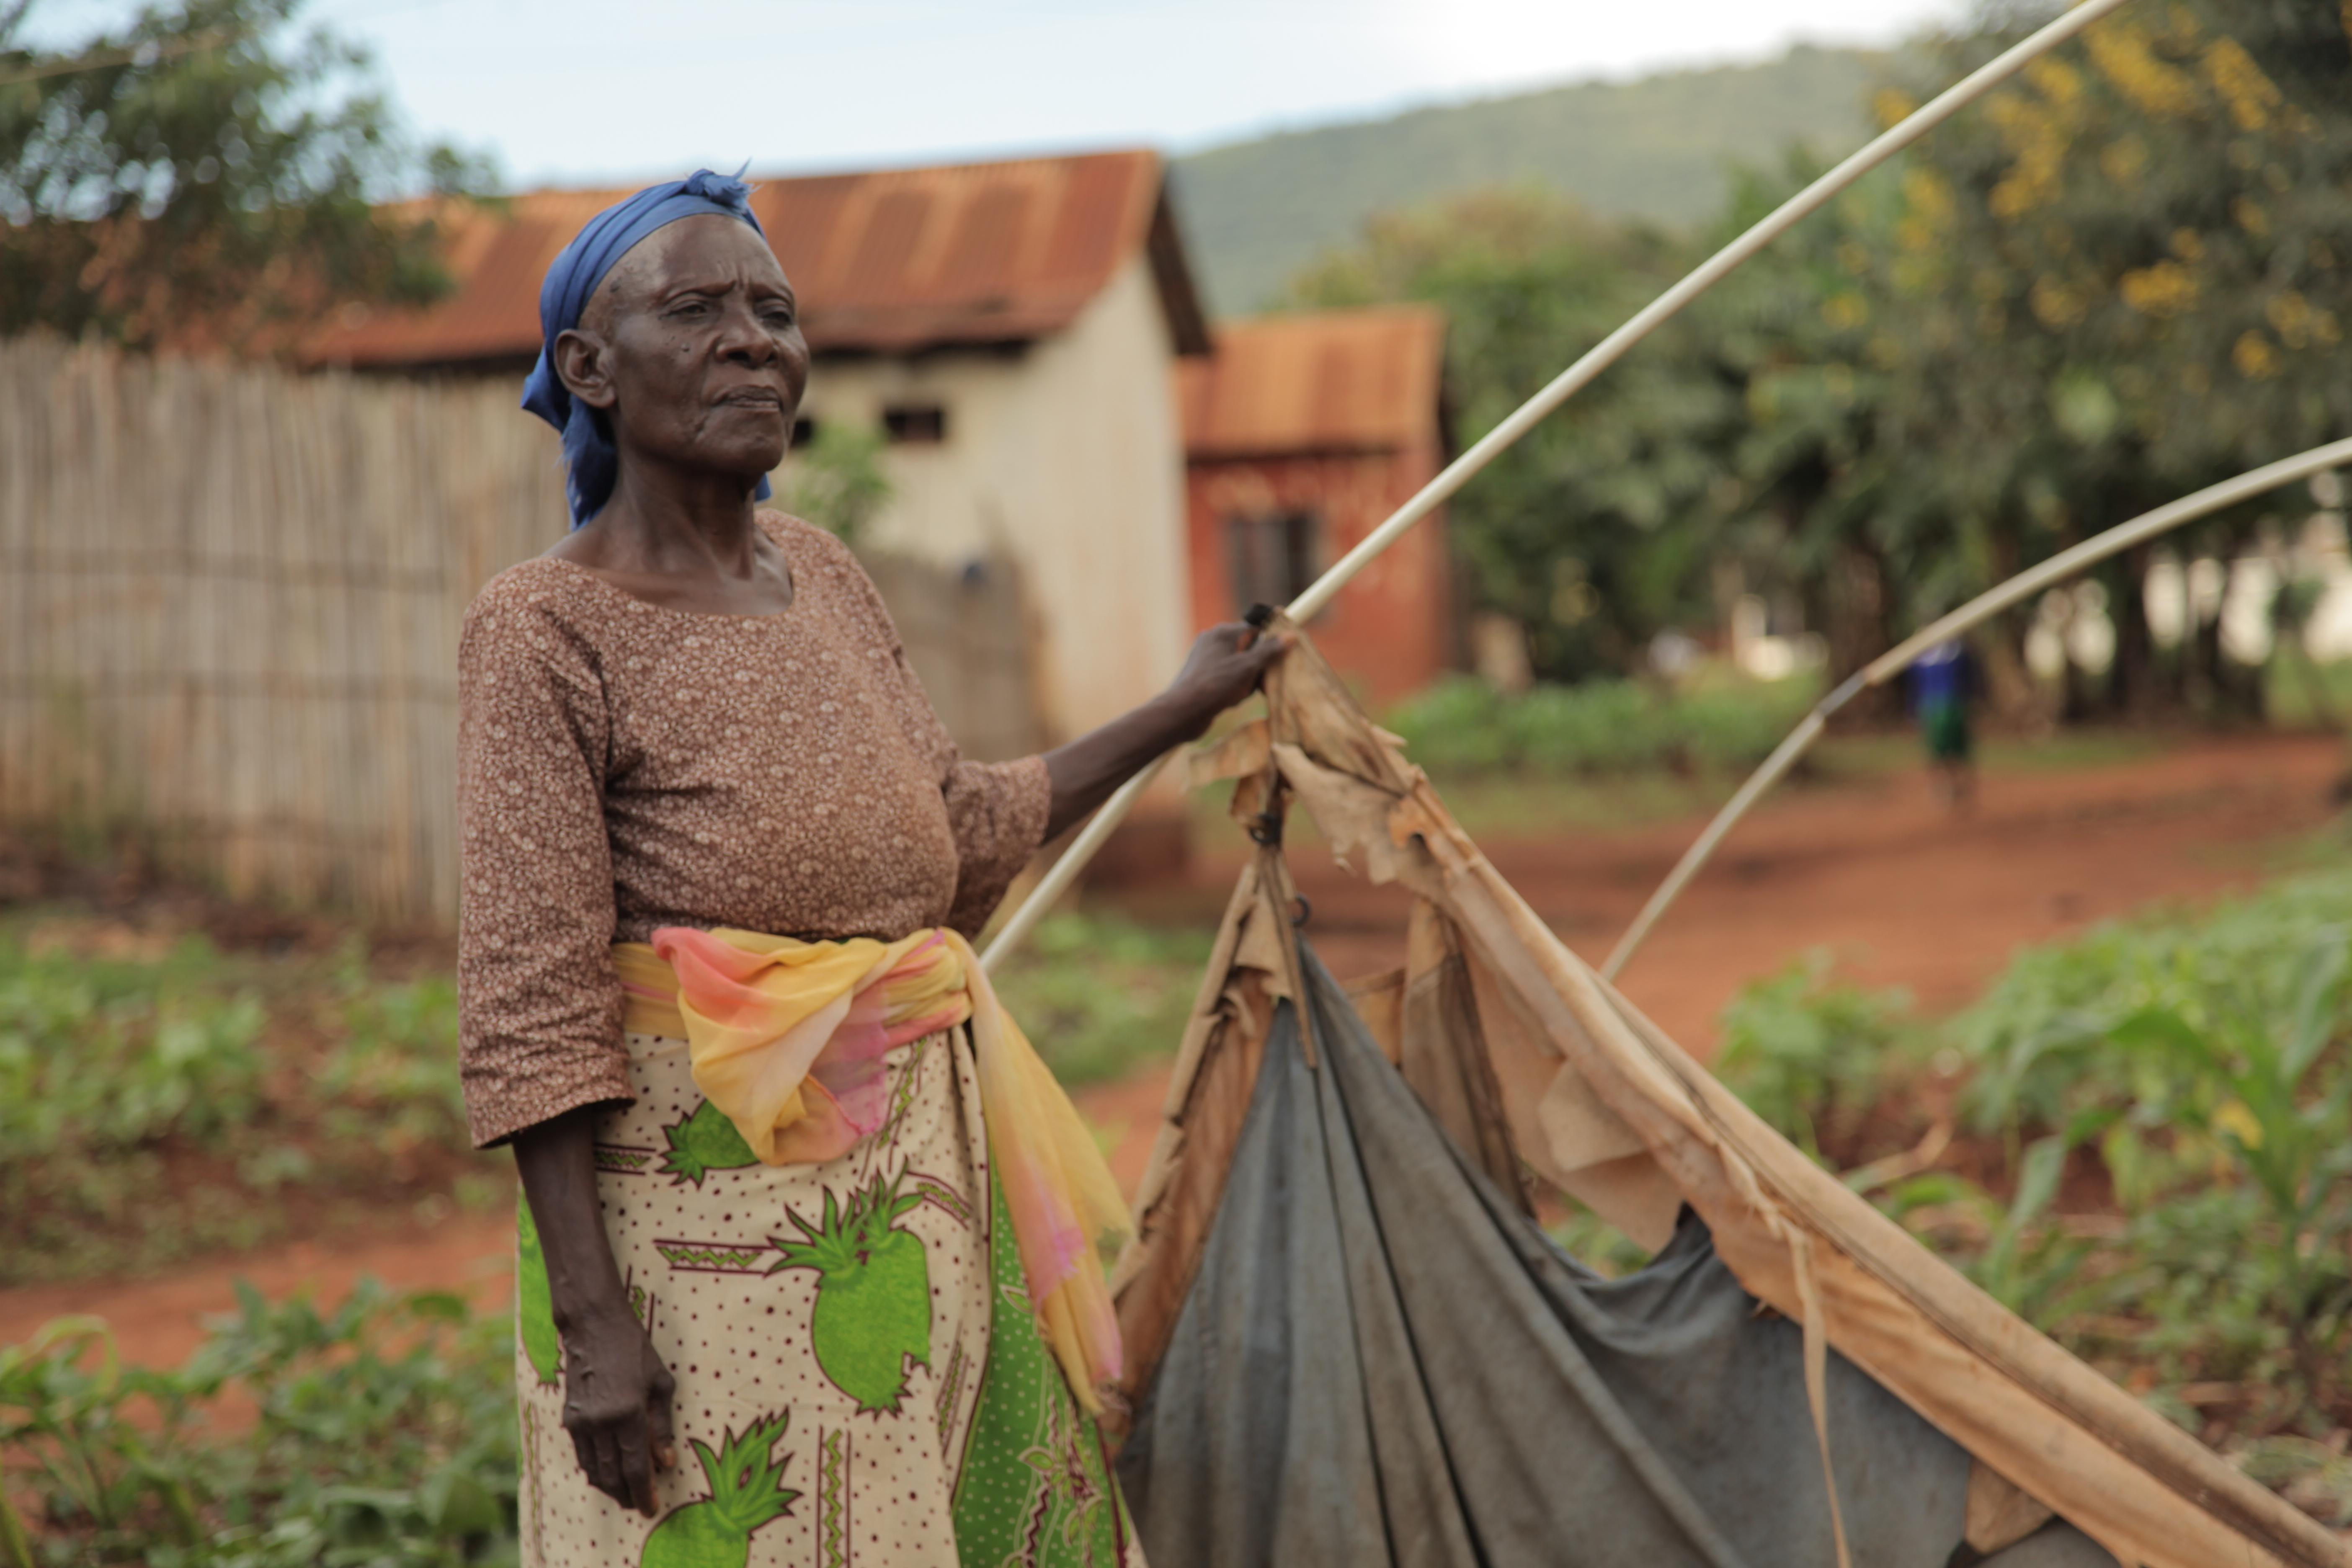 Mwajuma Hussein, 75, has been displaced for six years. Photo: Zahra Moloo